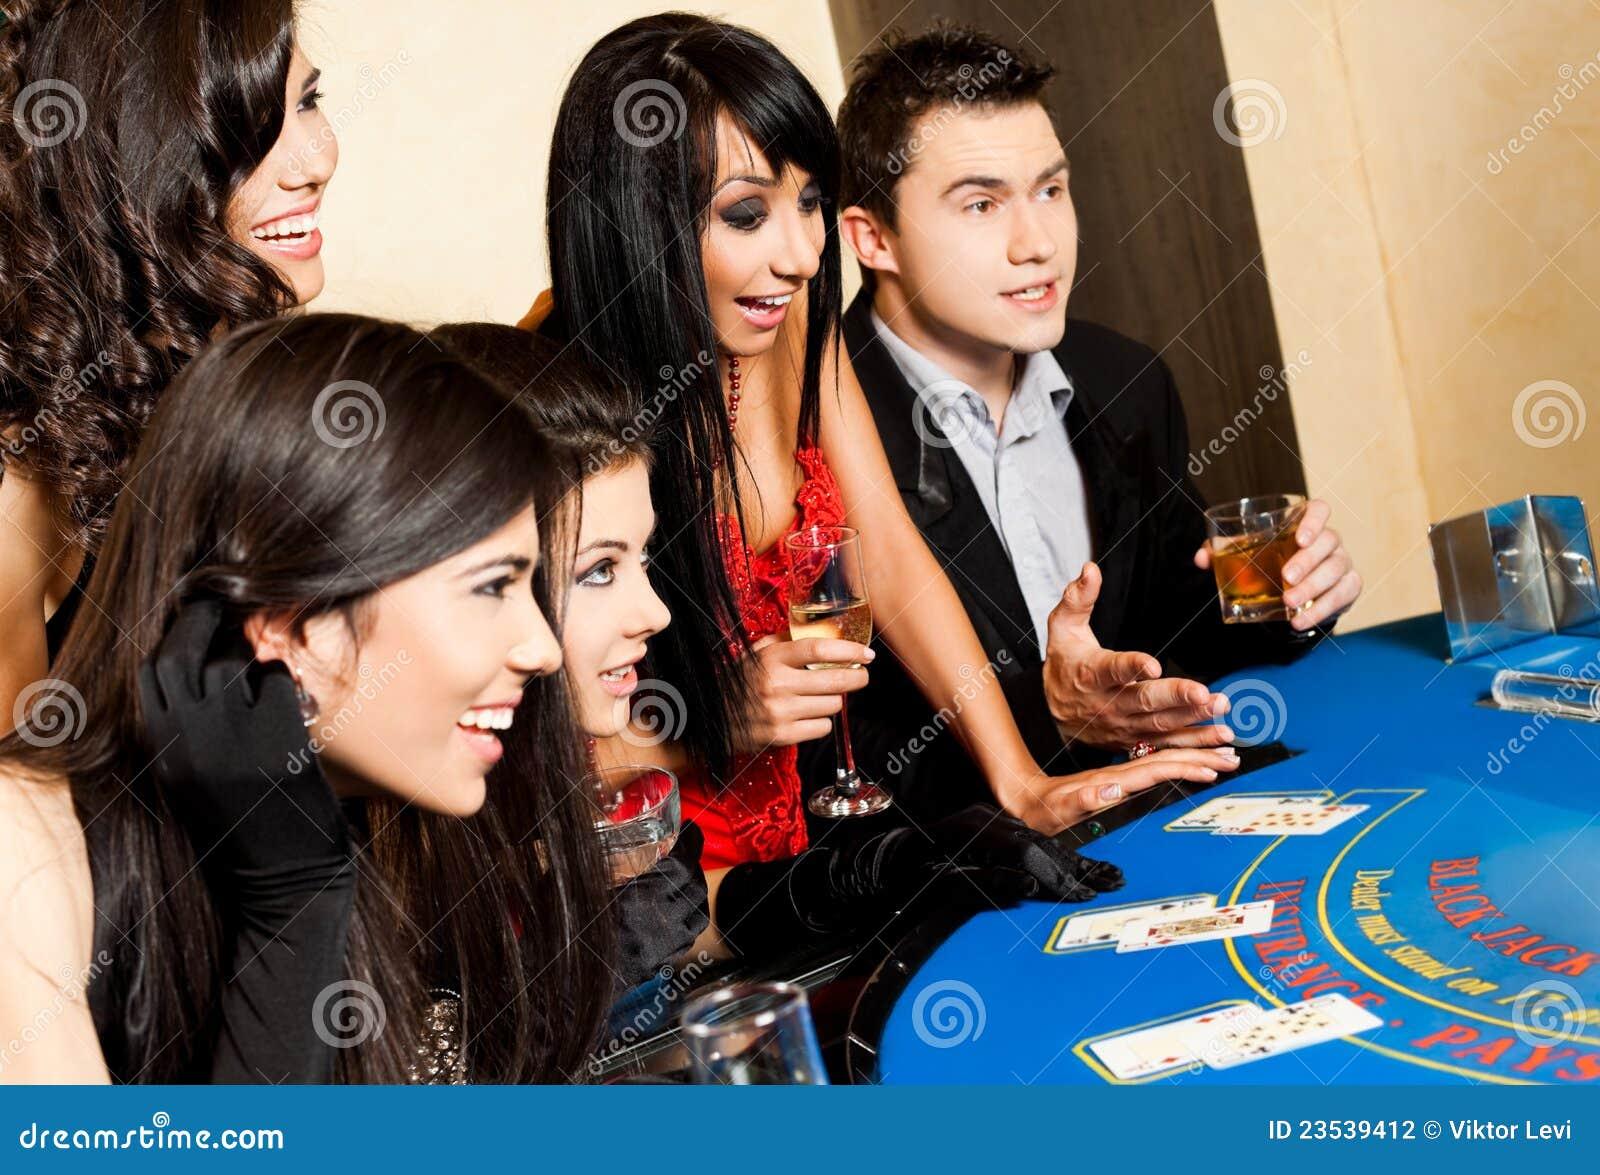 Casino Plot